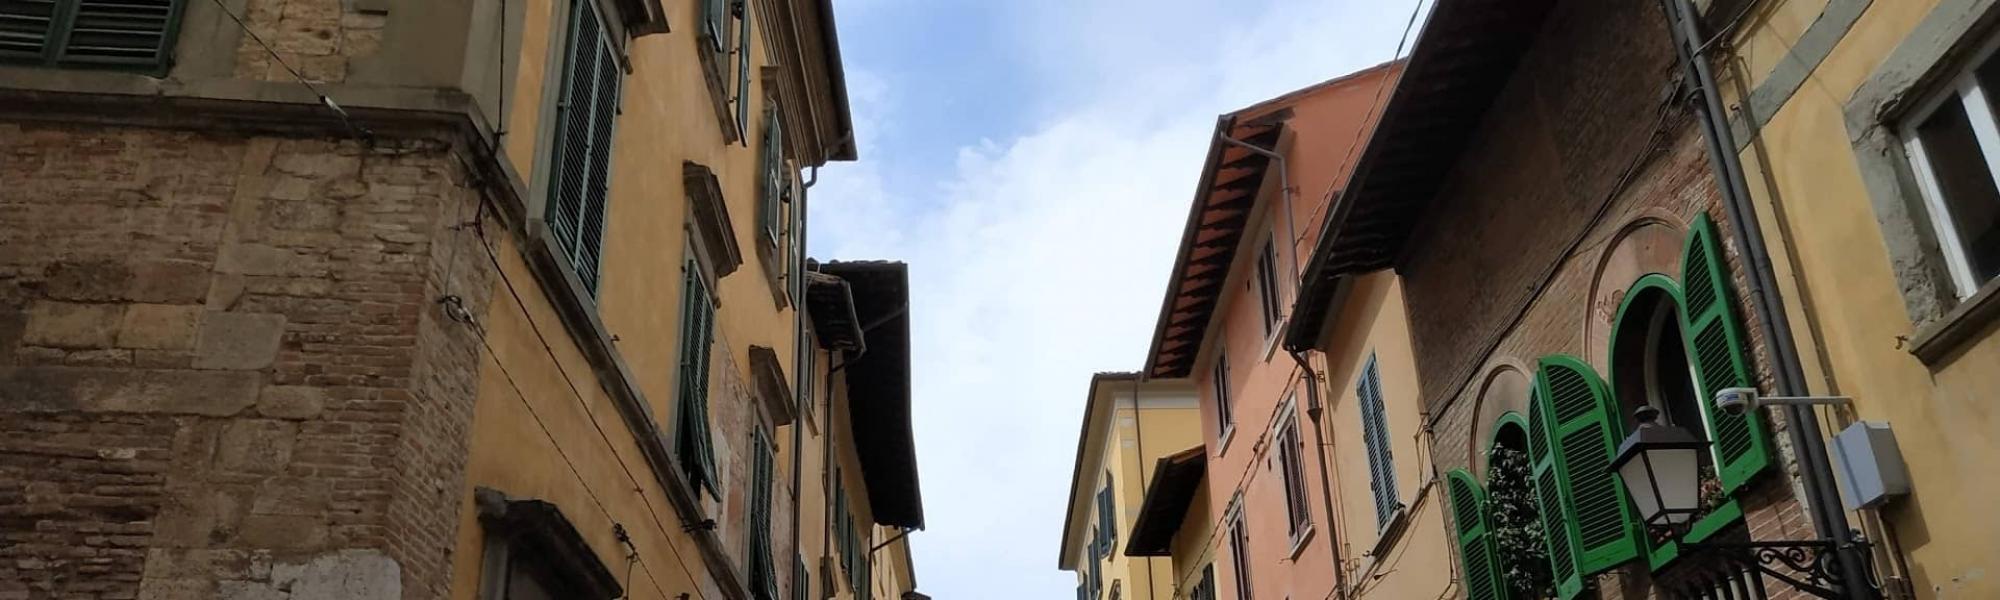 Scorcio Via San Martino (R. Cardini)